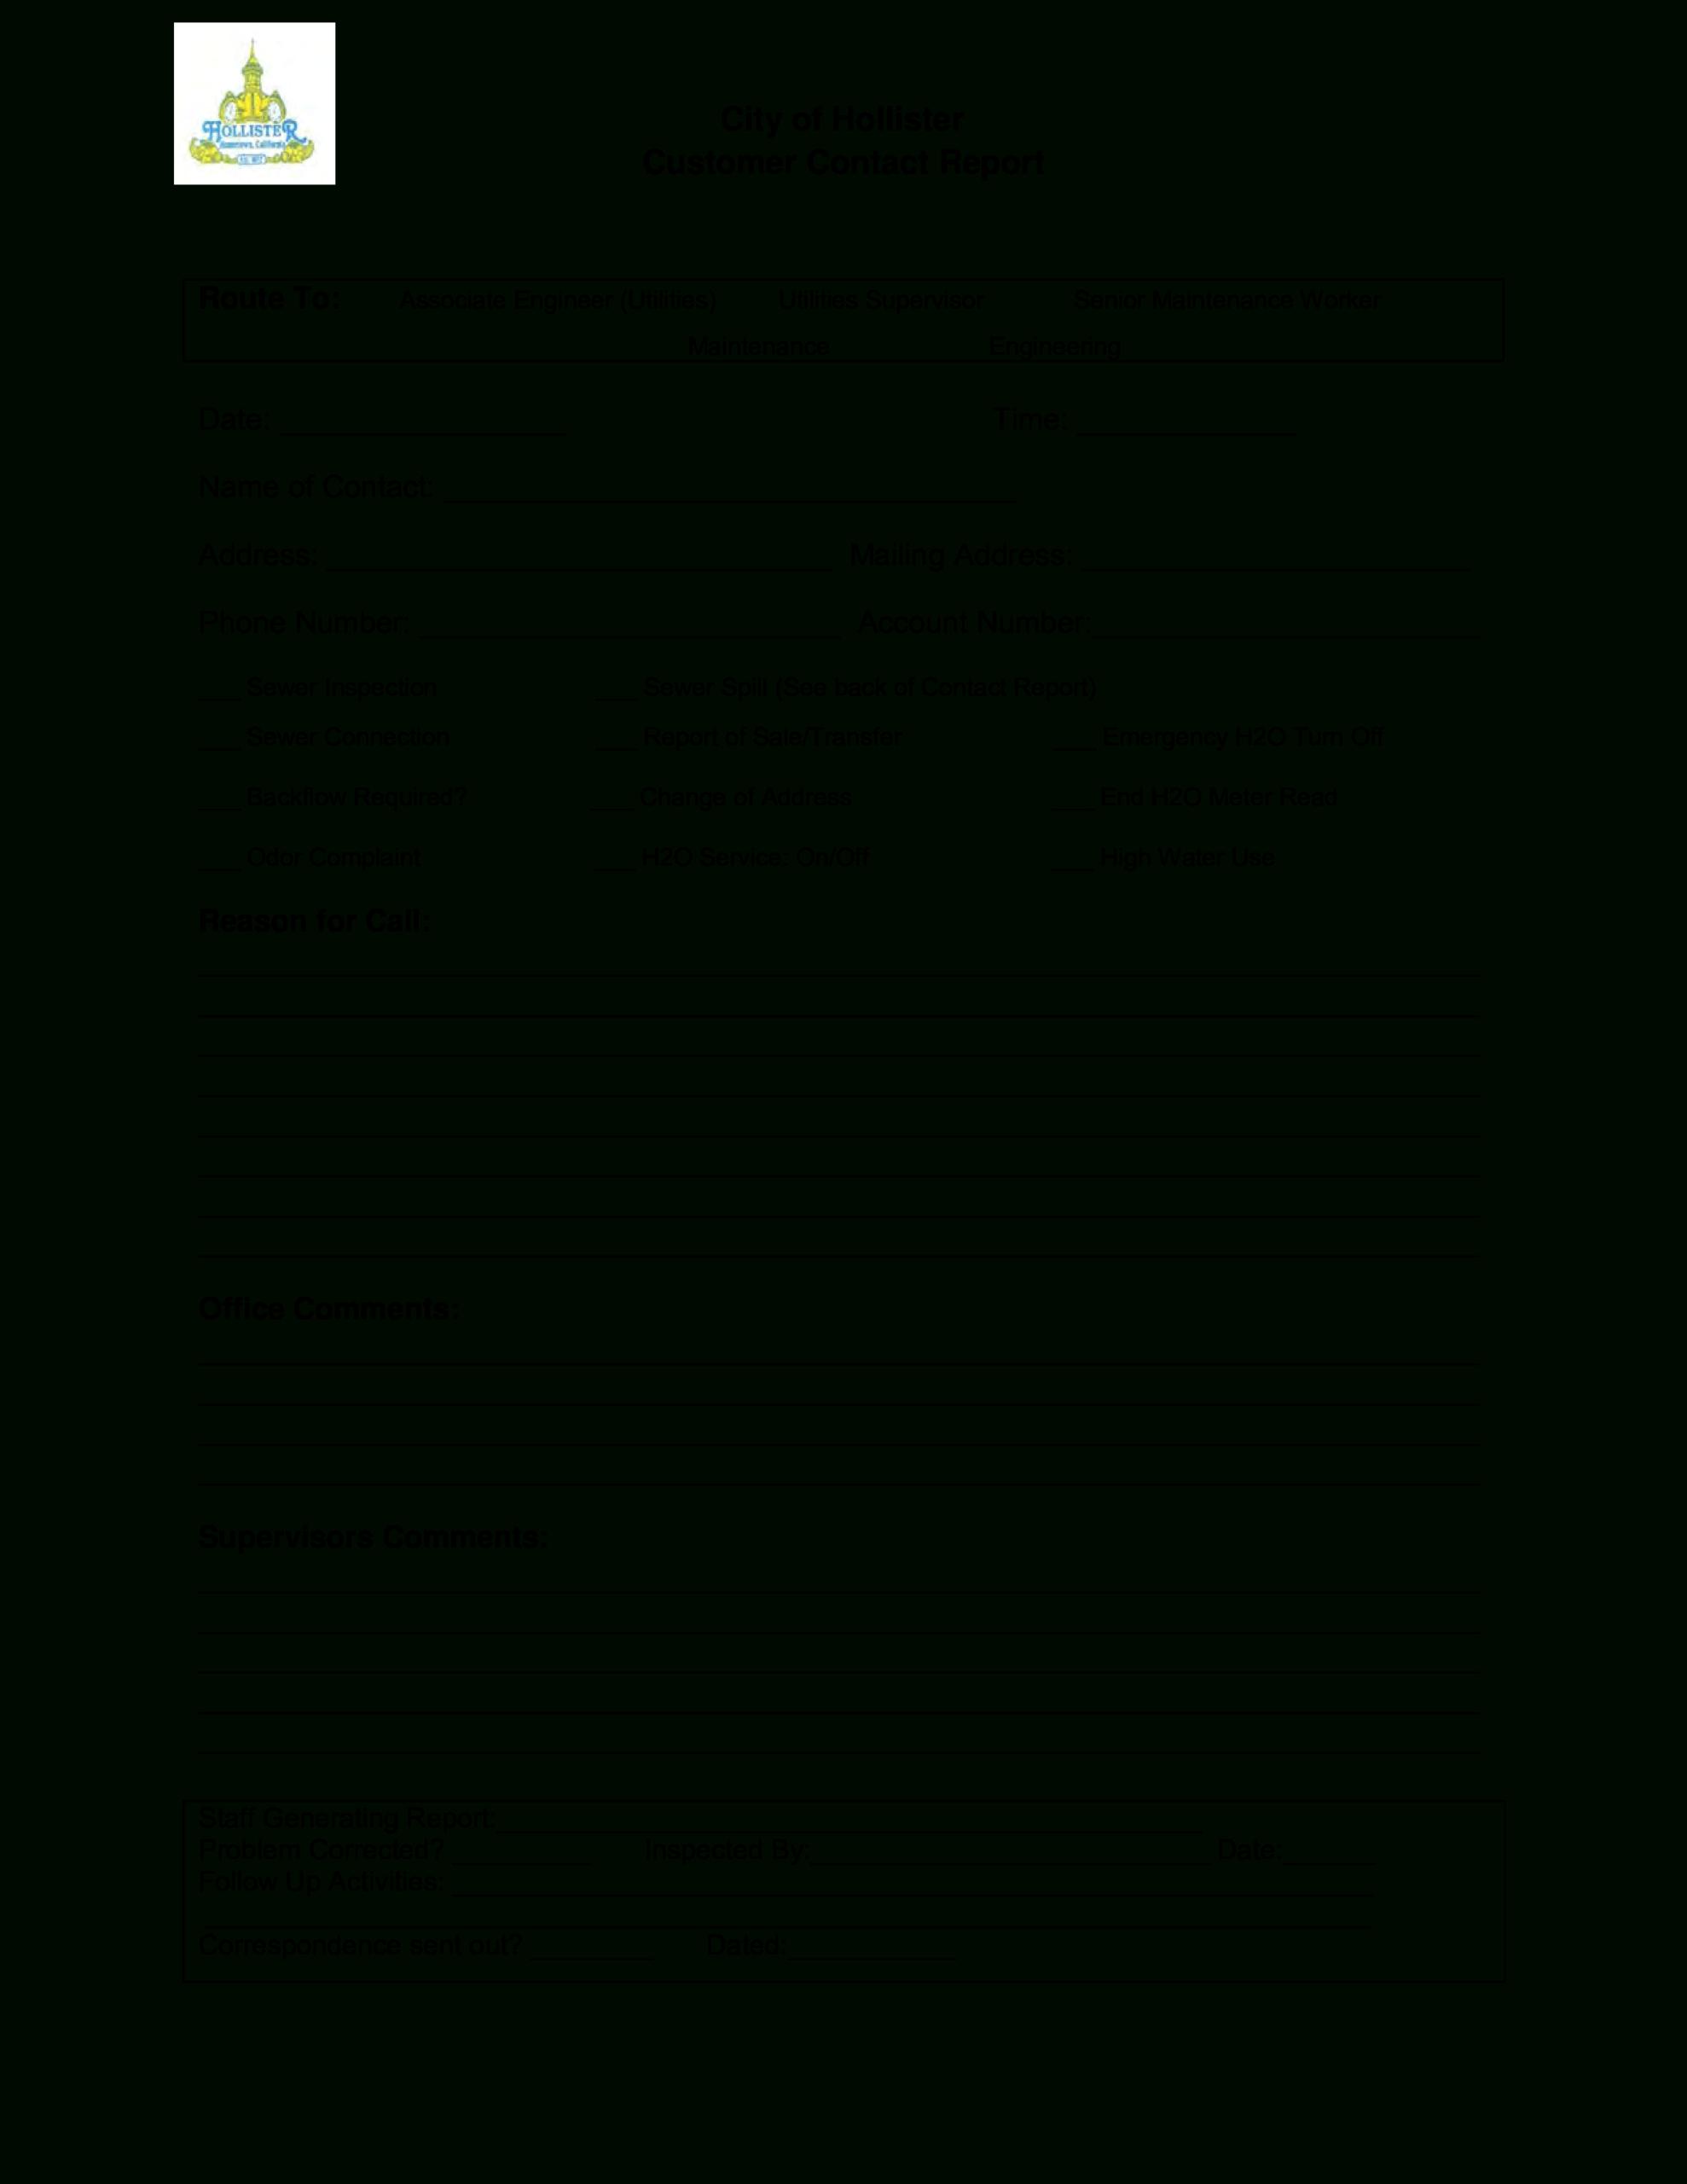 City Customer Contact Report | Templates At Within Customer Contact Report Template